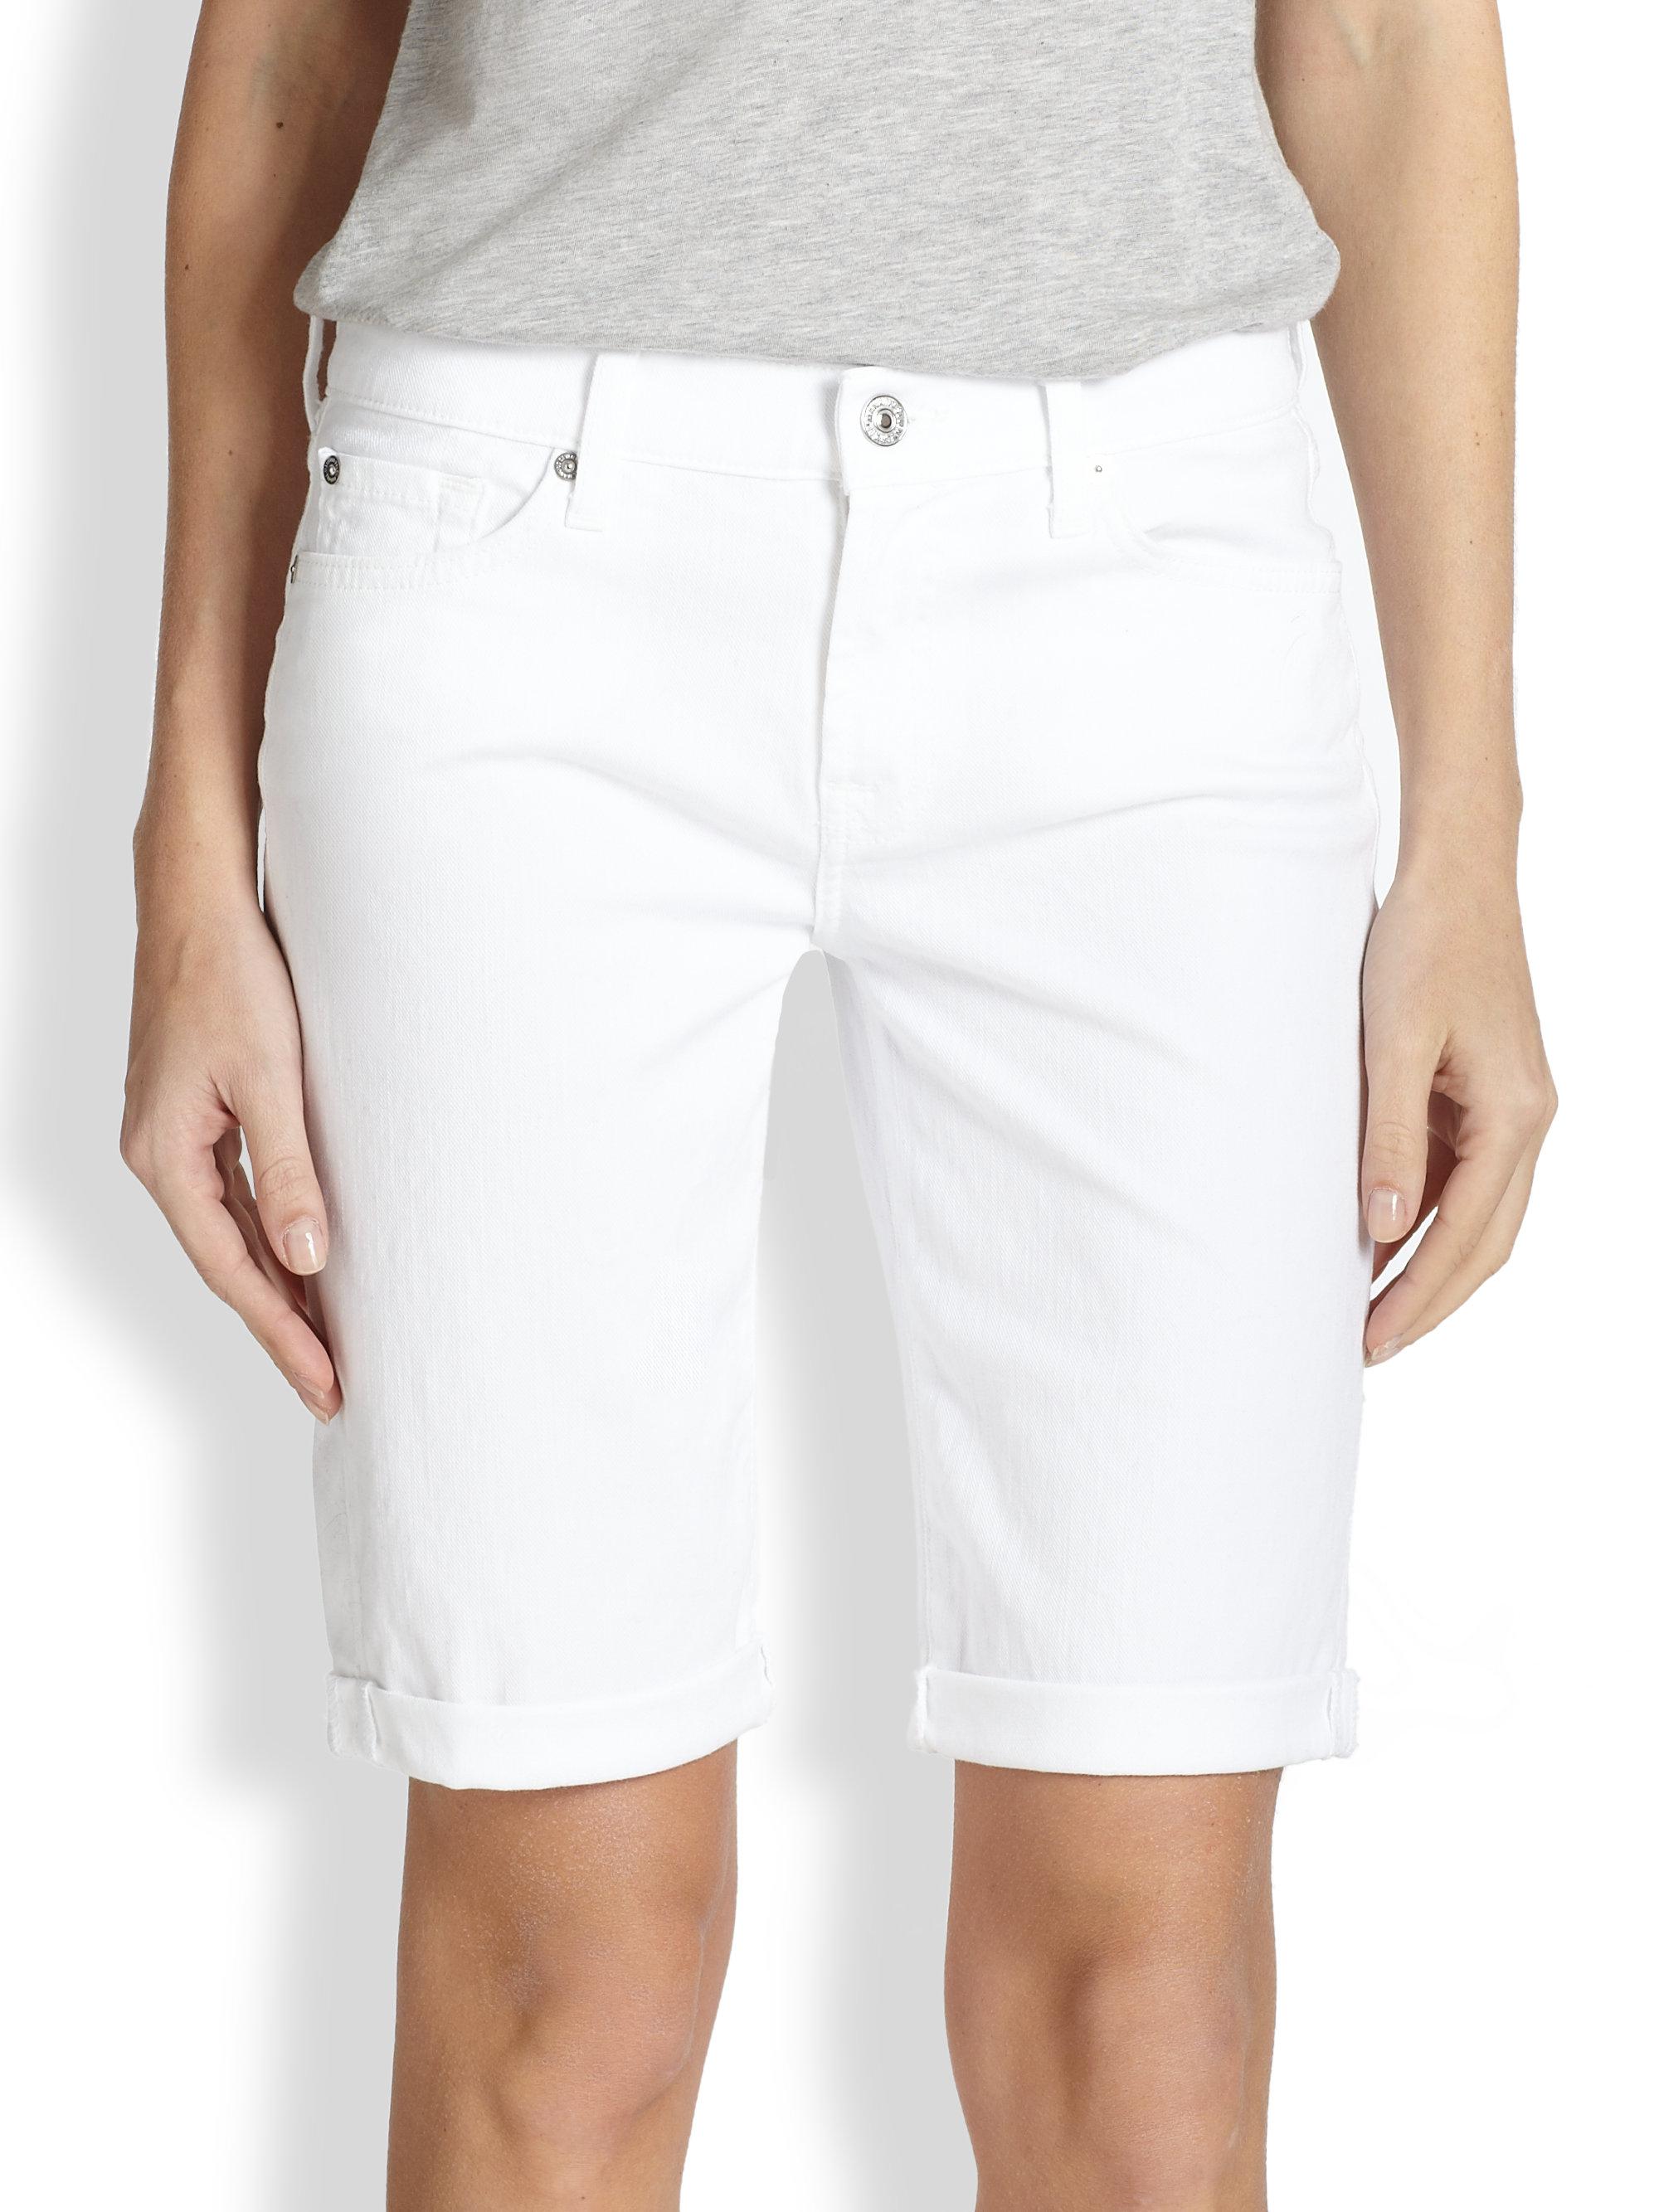 65abb1d9571 7 For All Mankind Stretch Denim Bermuda Shorts in White - Lyst